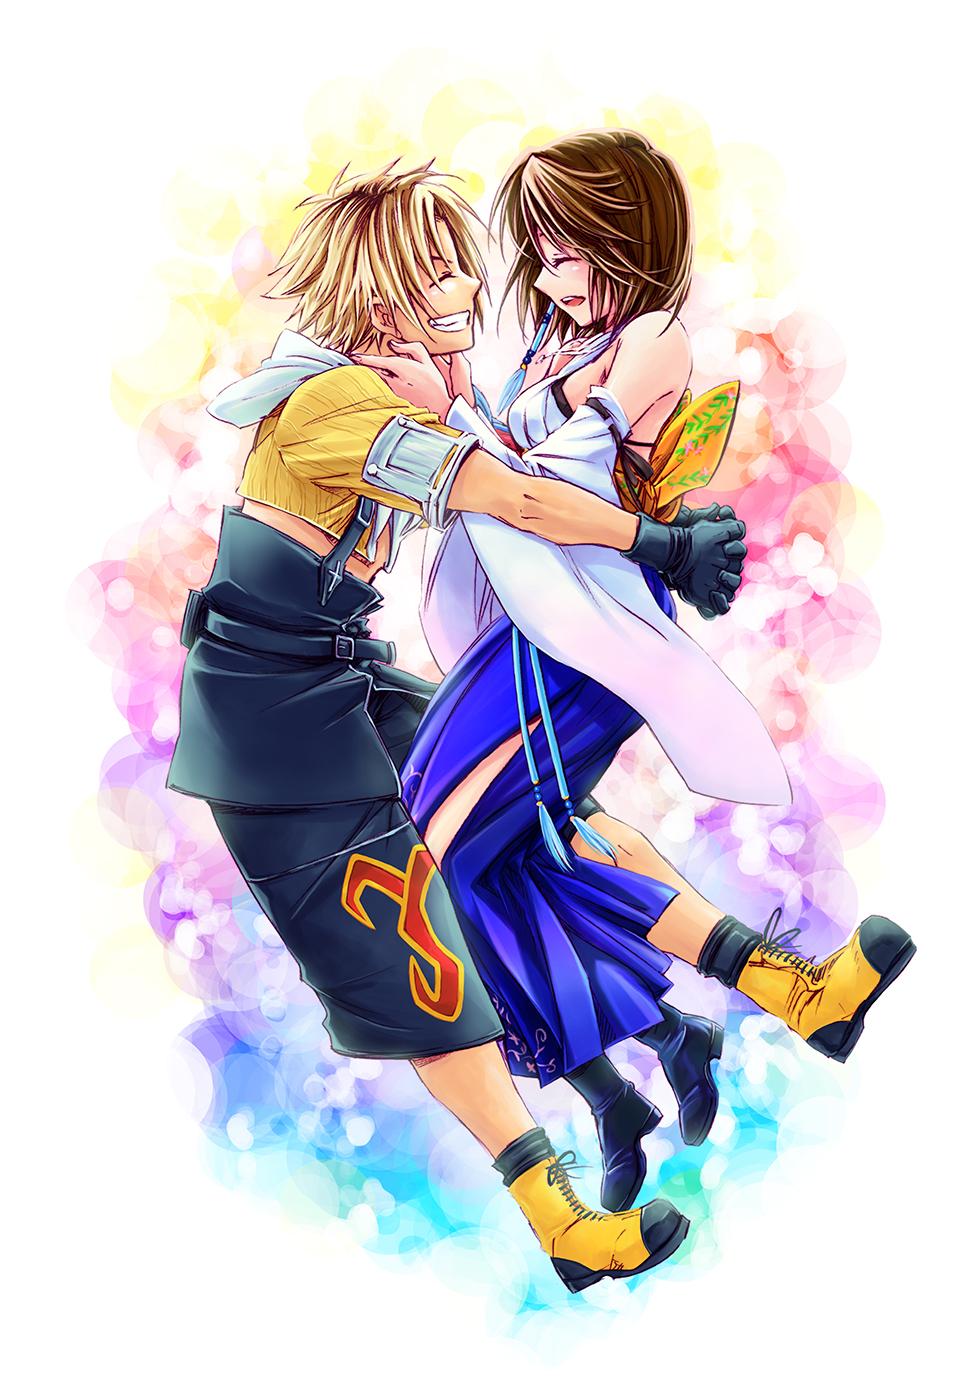 tidus and yuna relationship quiz